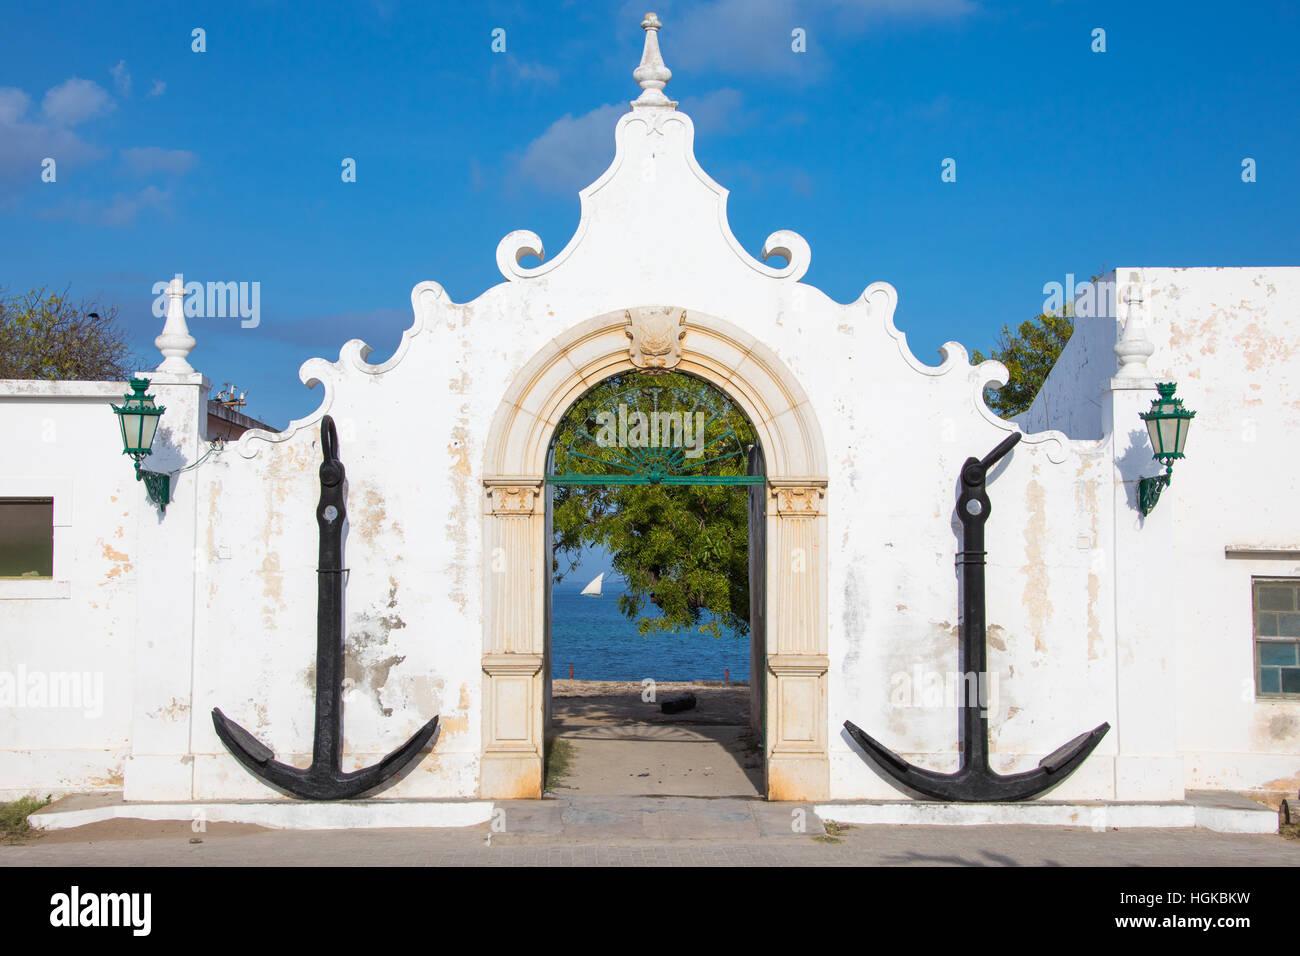 Former Portuguese Port Authority on Mozambique Island (Ilha de Mocambique), Mozambique - Stock Image